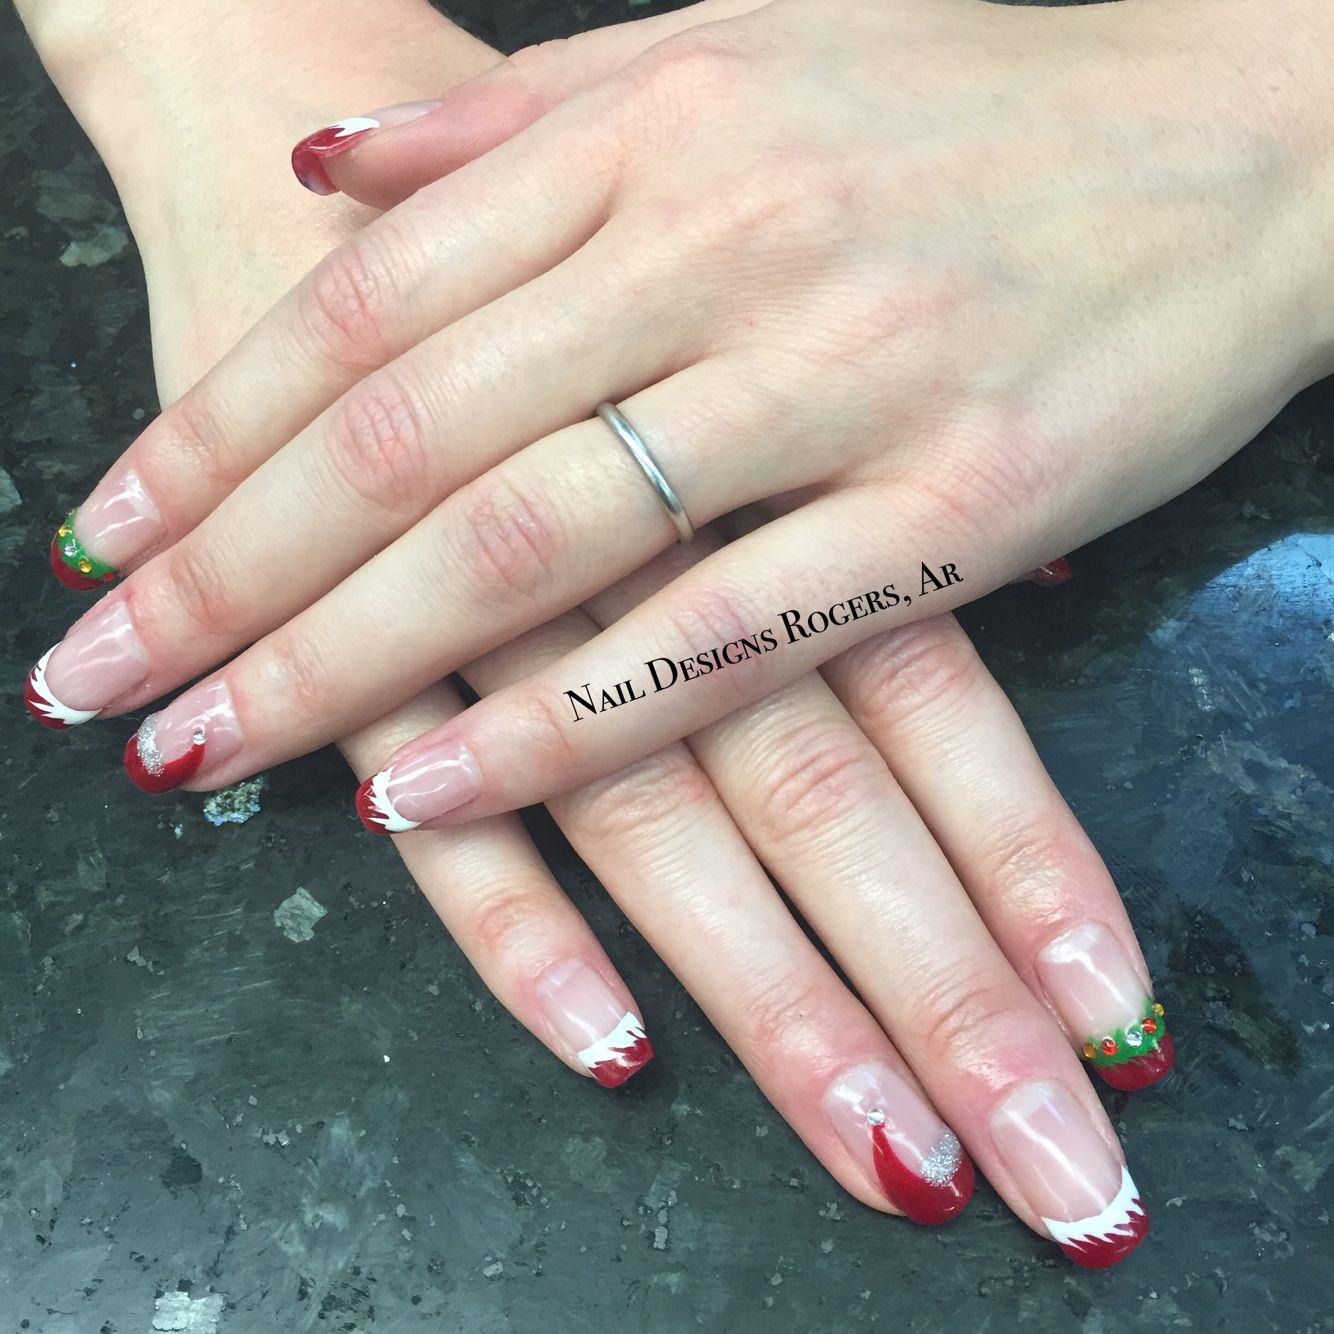 Red tips with glazed and Santa hats and wreaths in shellac. Nail arts. Nail designs. Christmas nails